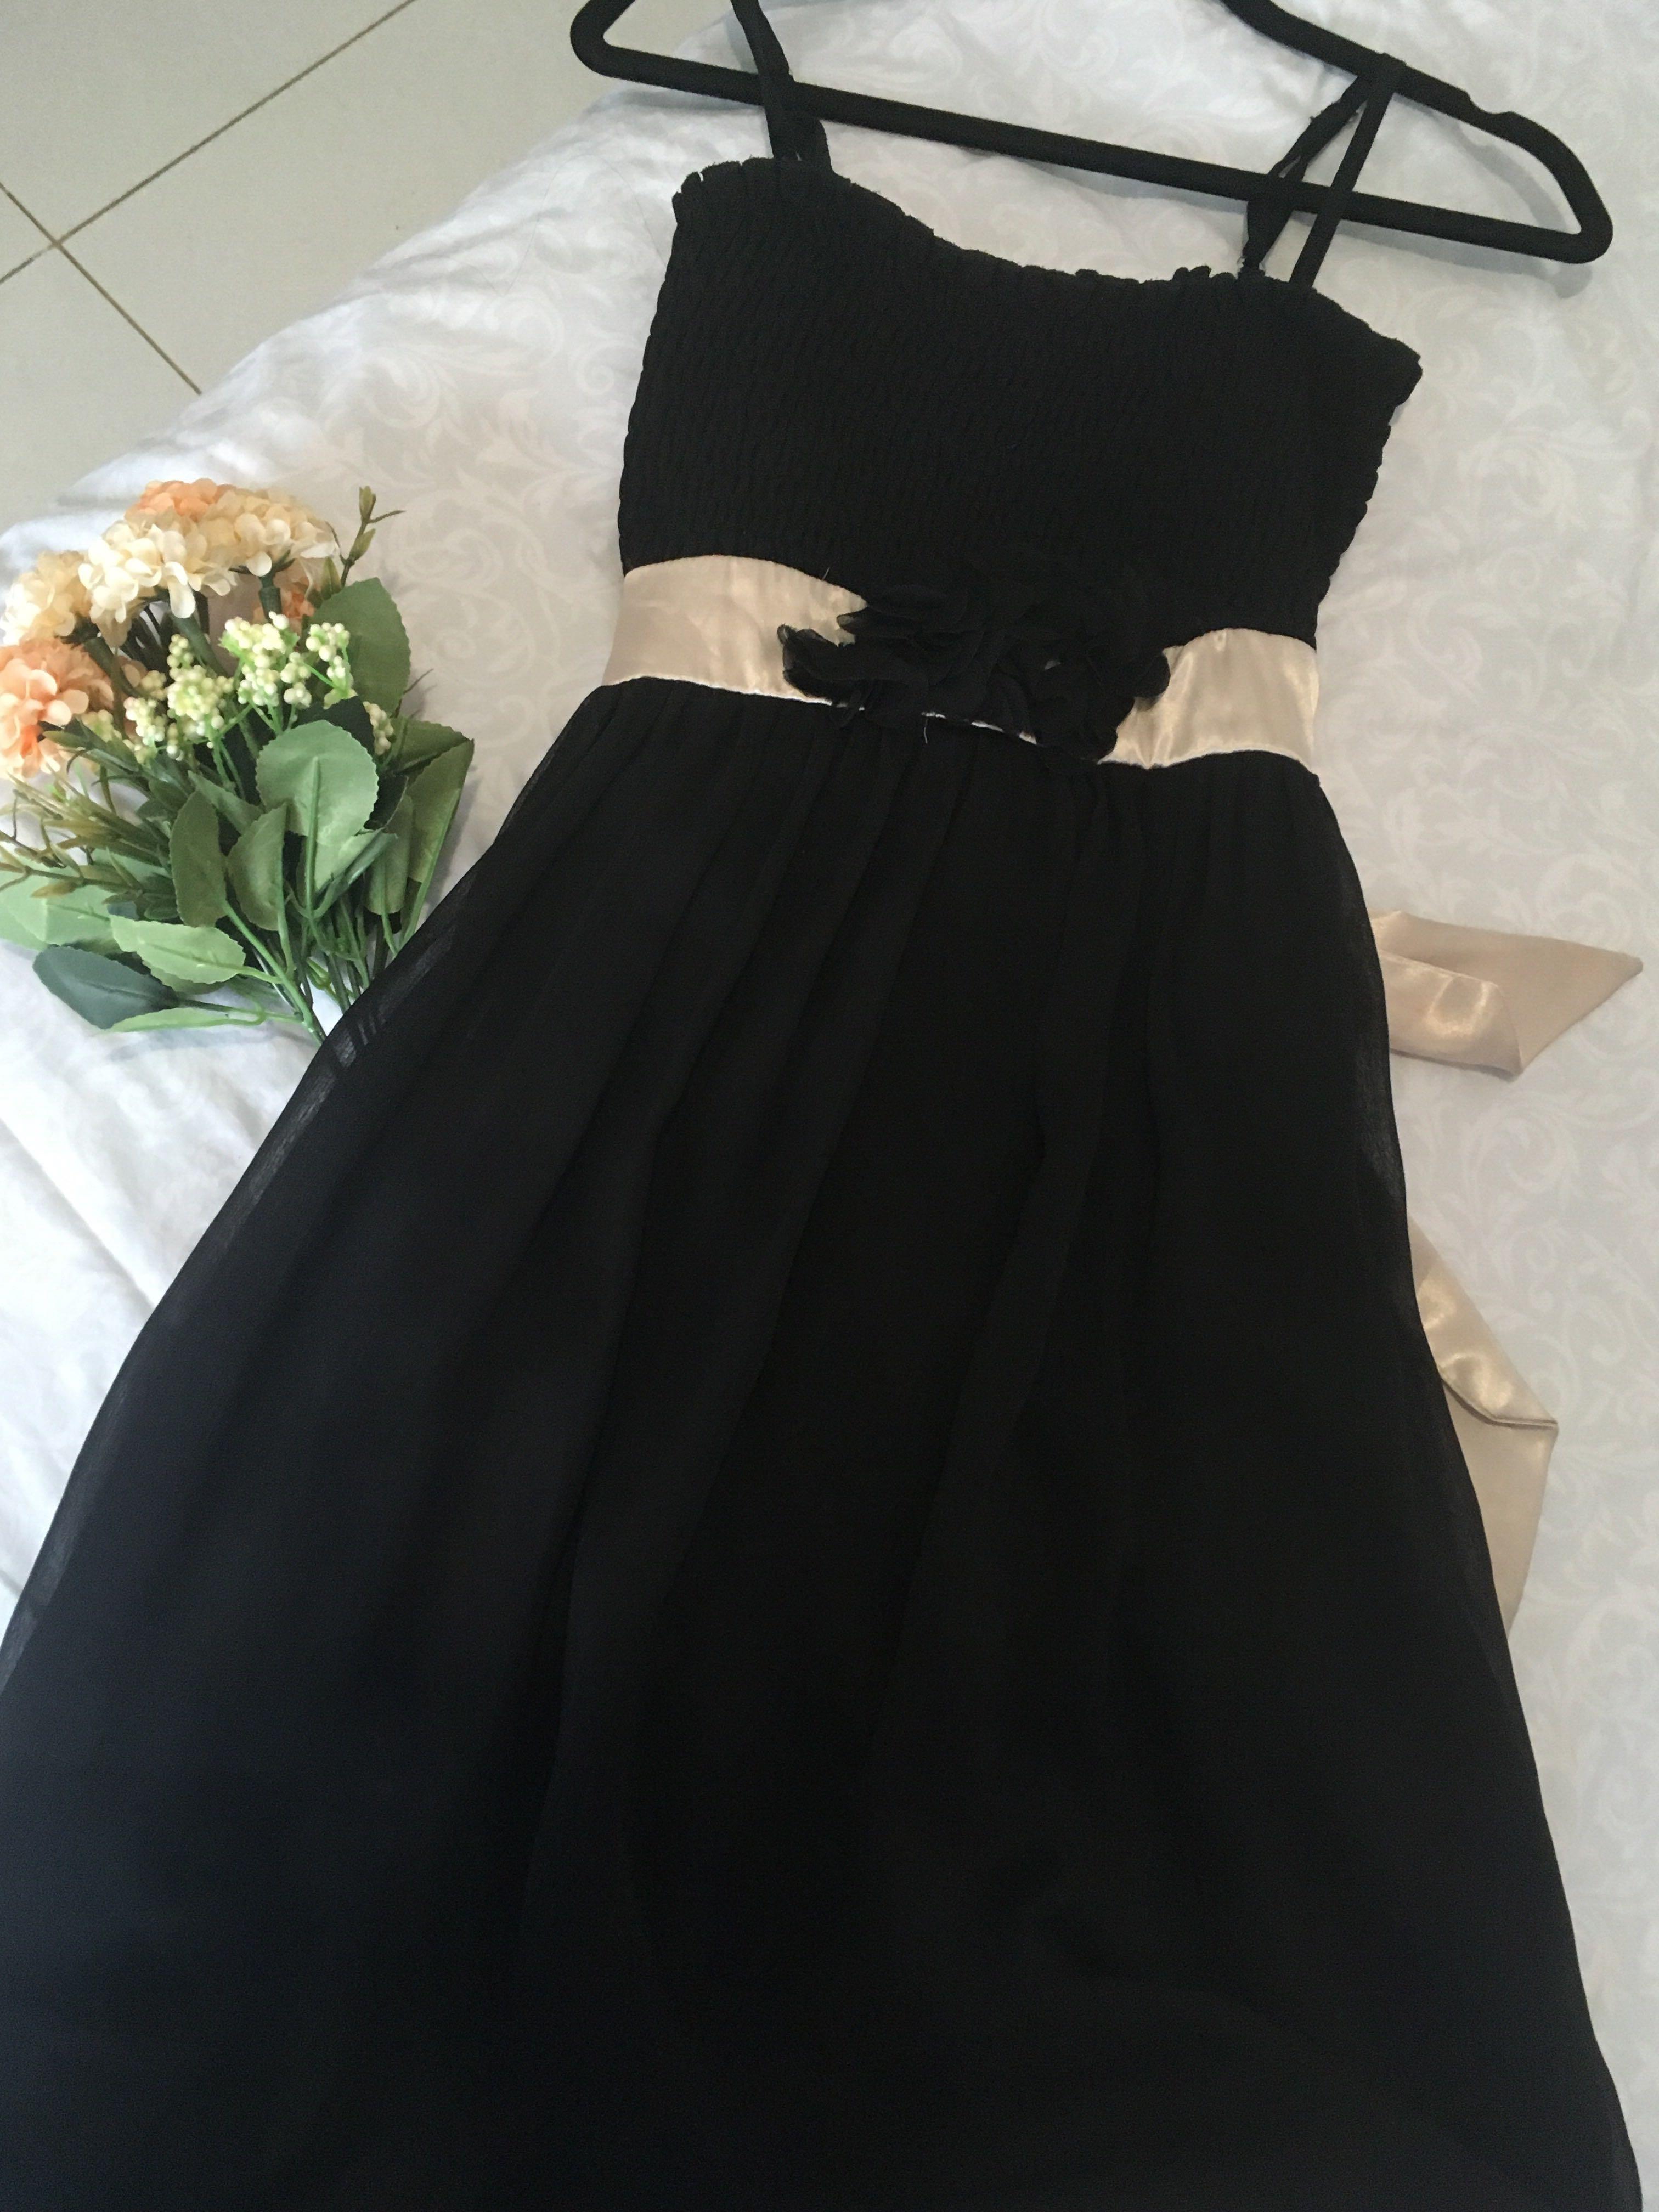 Dress hitam anak pita gold